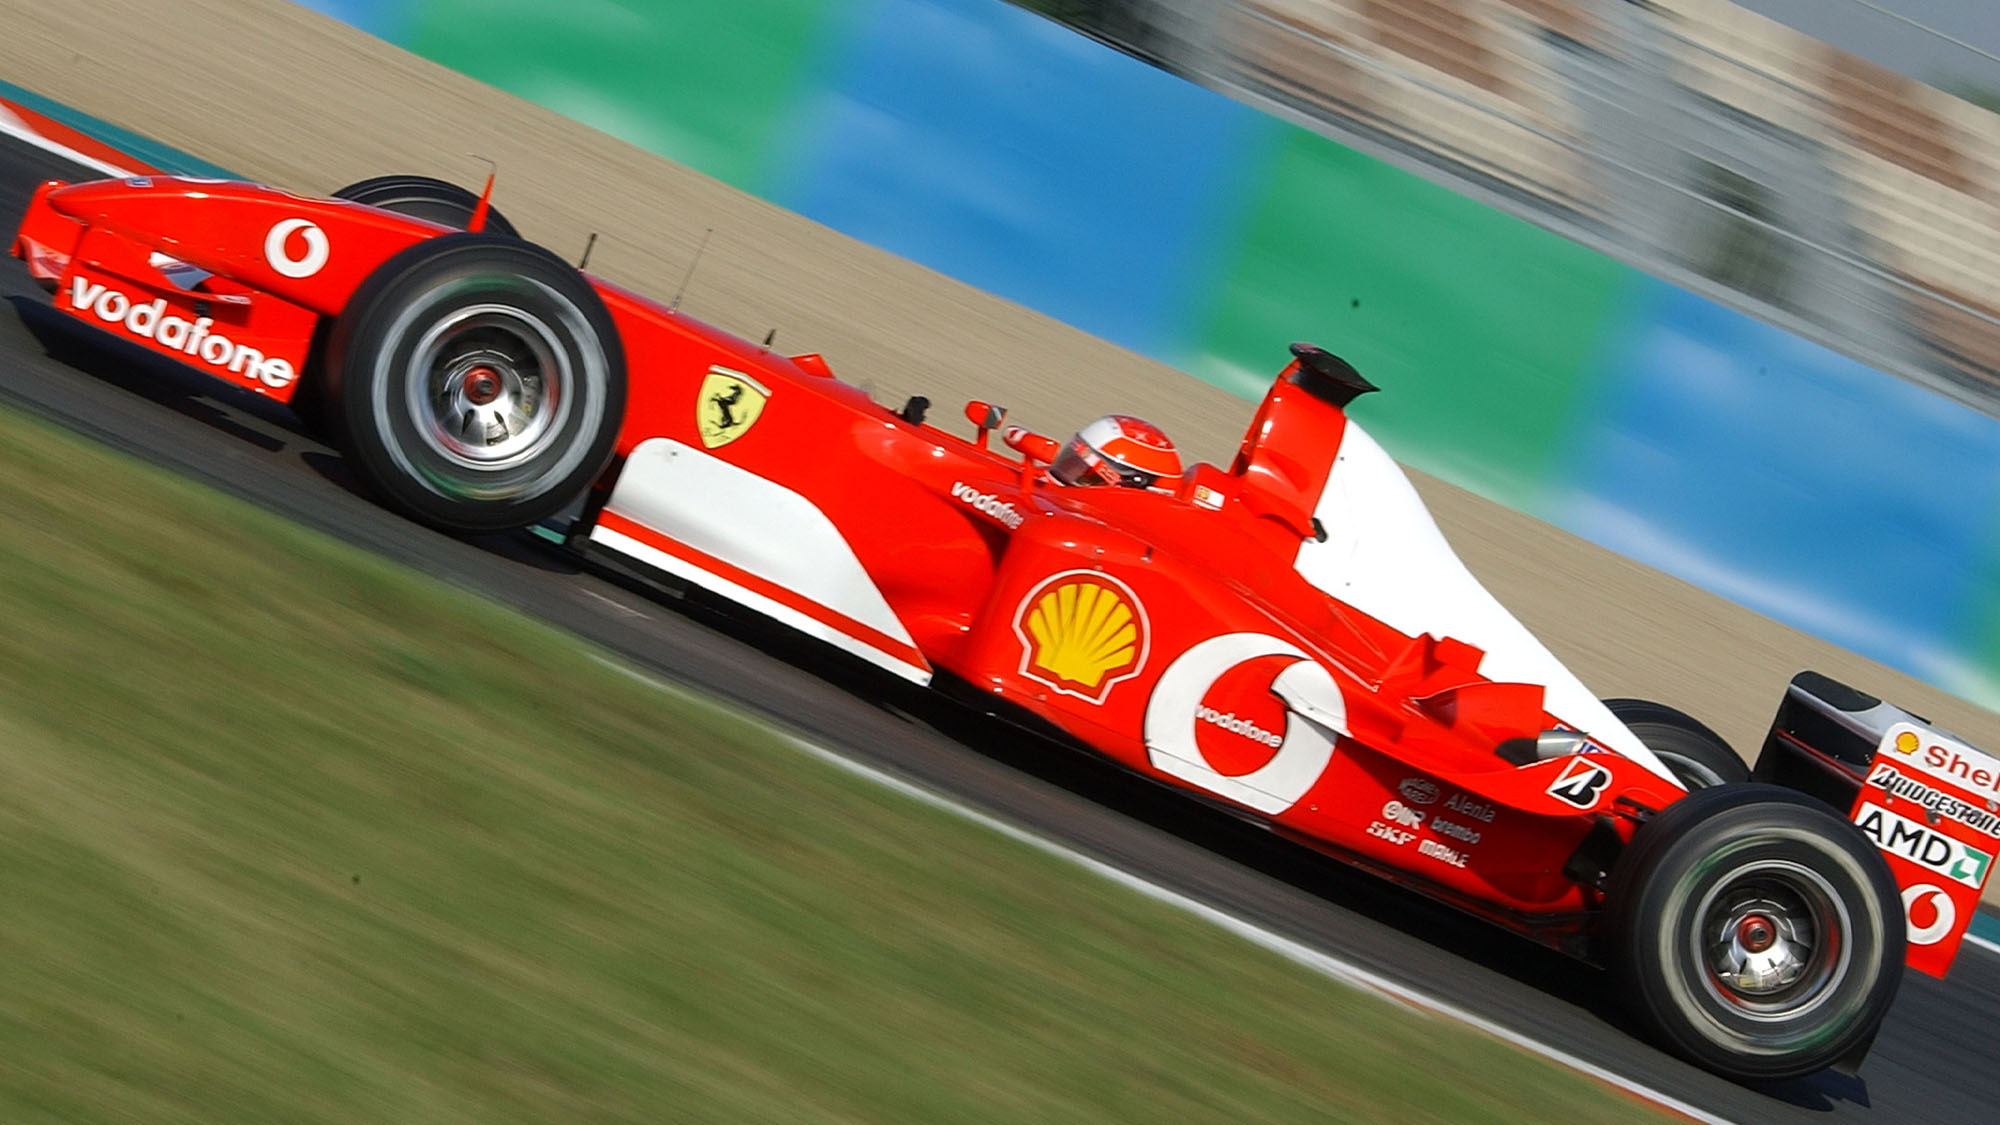 AUTO - F1 2002 - FRANCE GP - MAGNY COURS 20020721 - PHOTO: GILLES LEVENT / DPPI N¡ 1 - MICHAEL SCHUMACHER (GER) / FERRARI - ACTION # 00000795_118